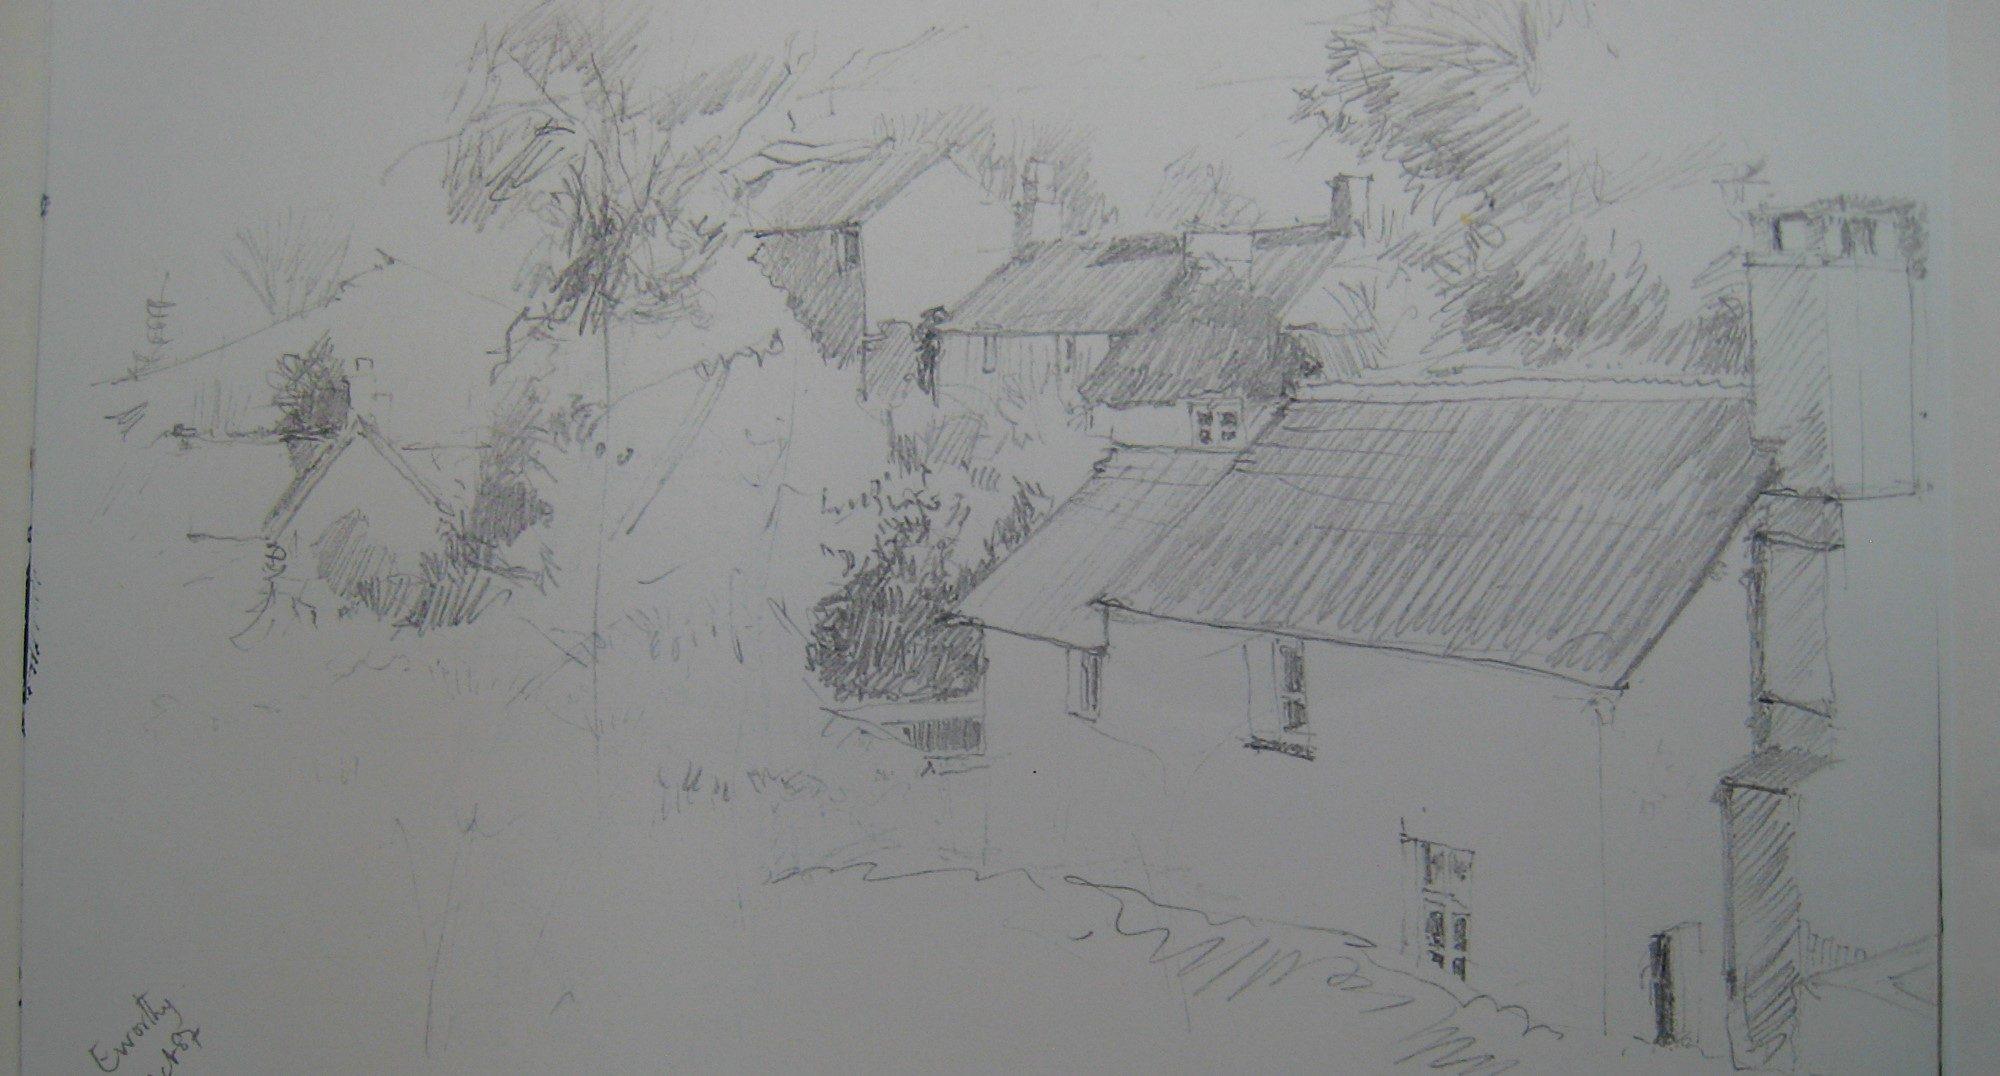 drawing of Eworthy hamlet